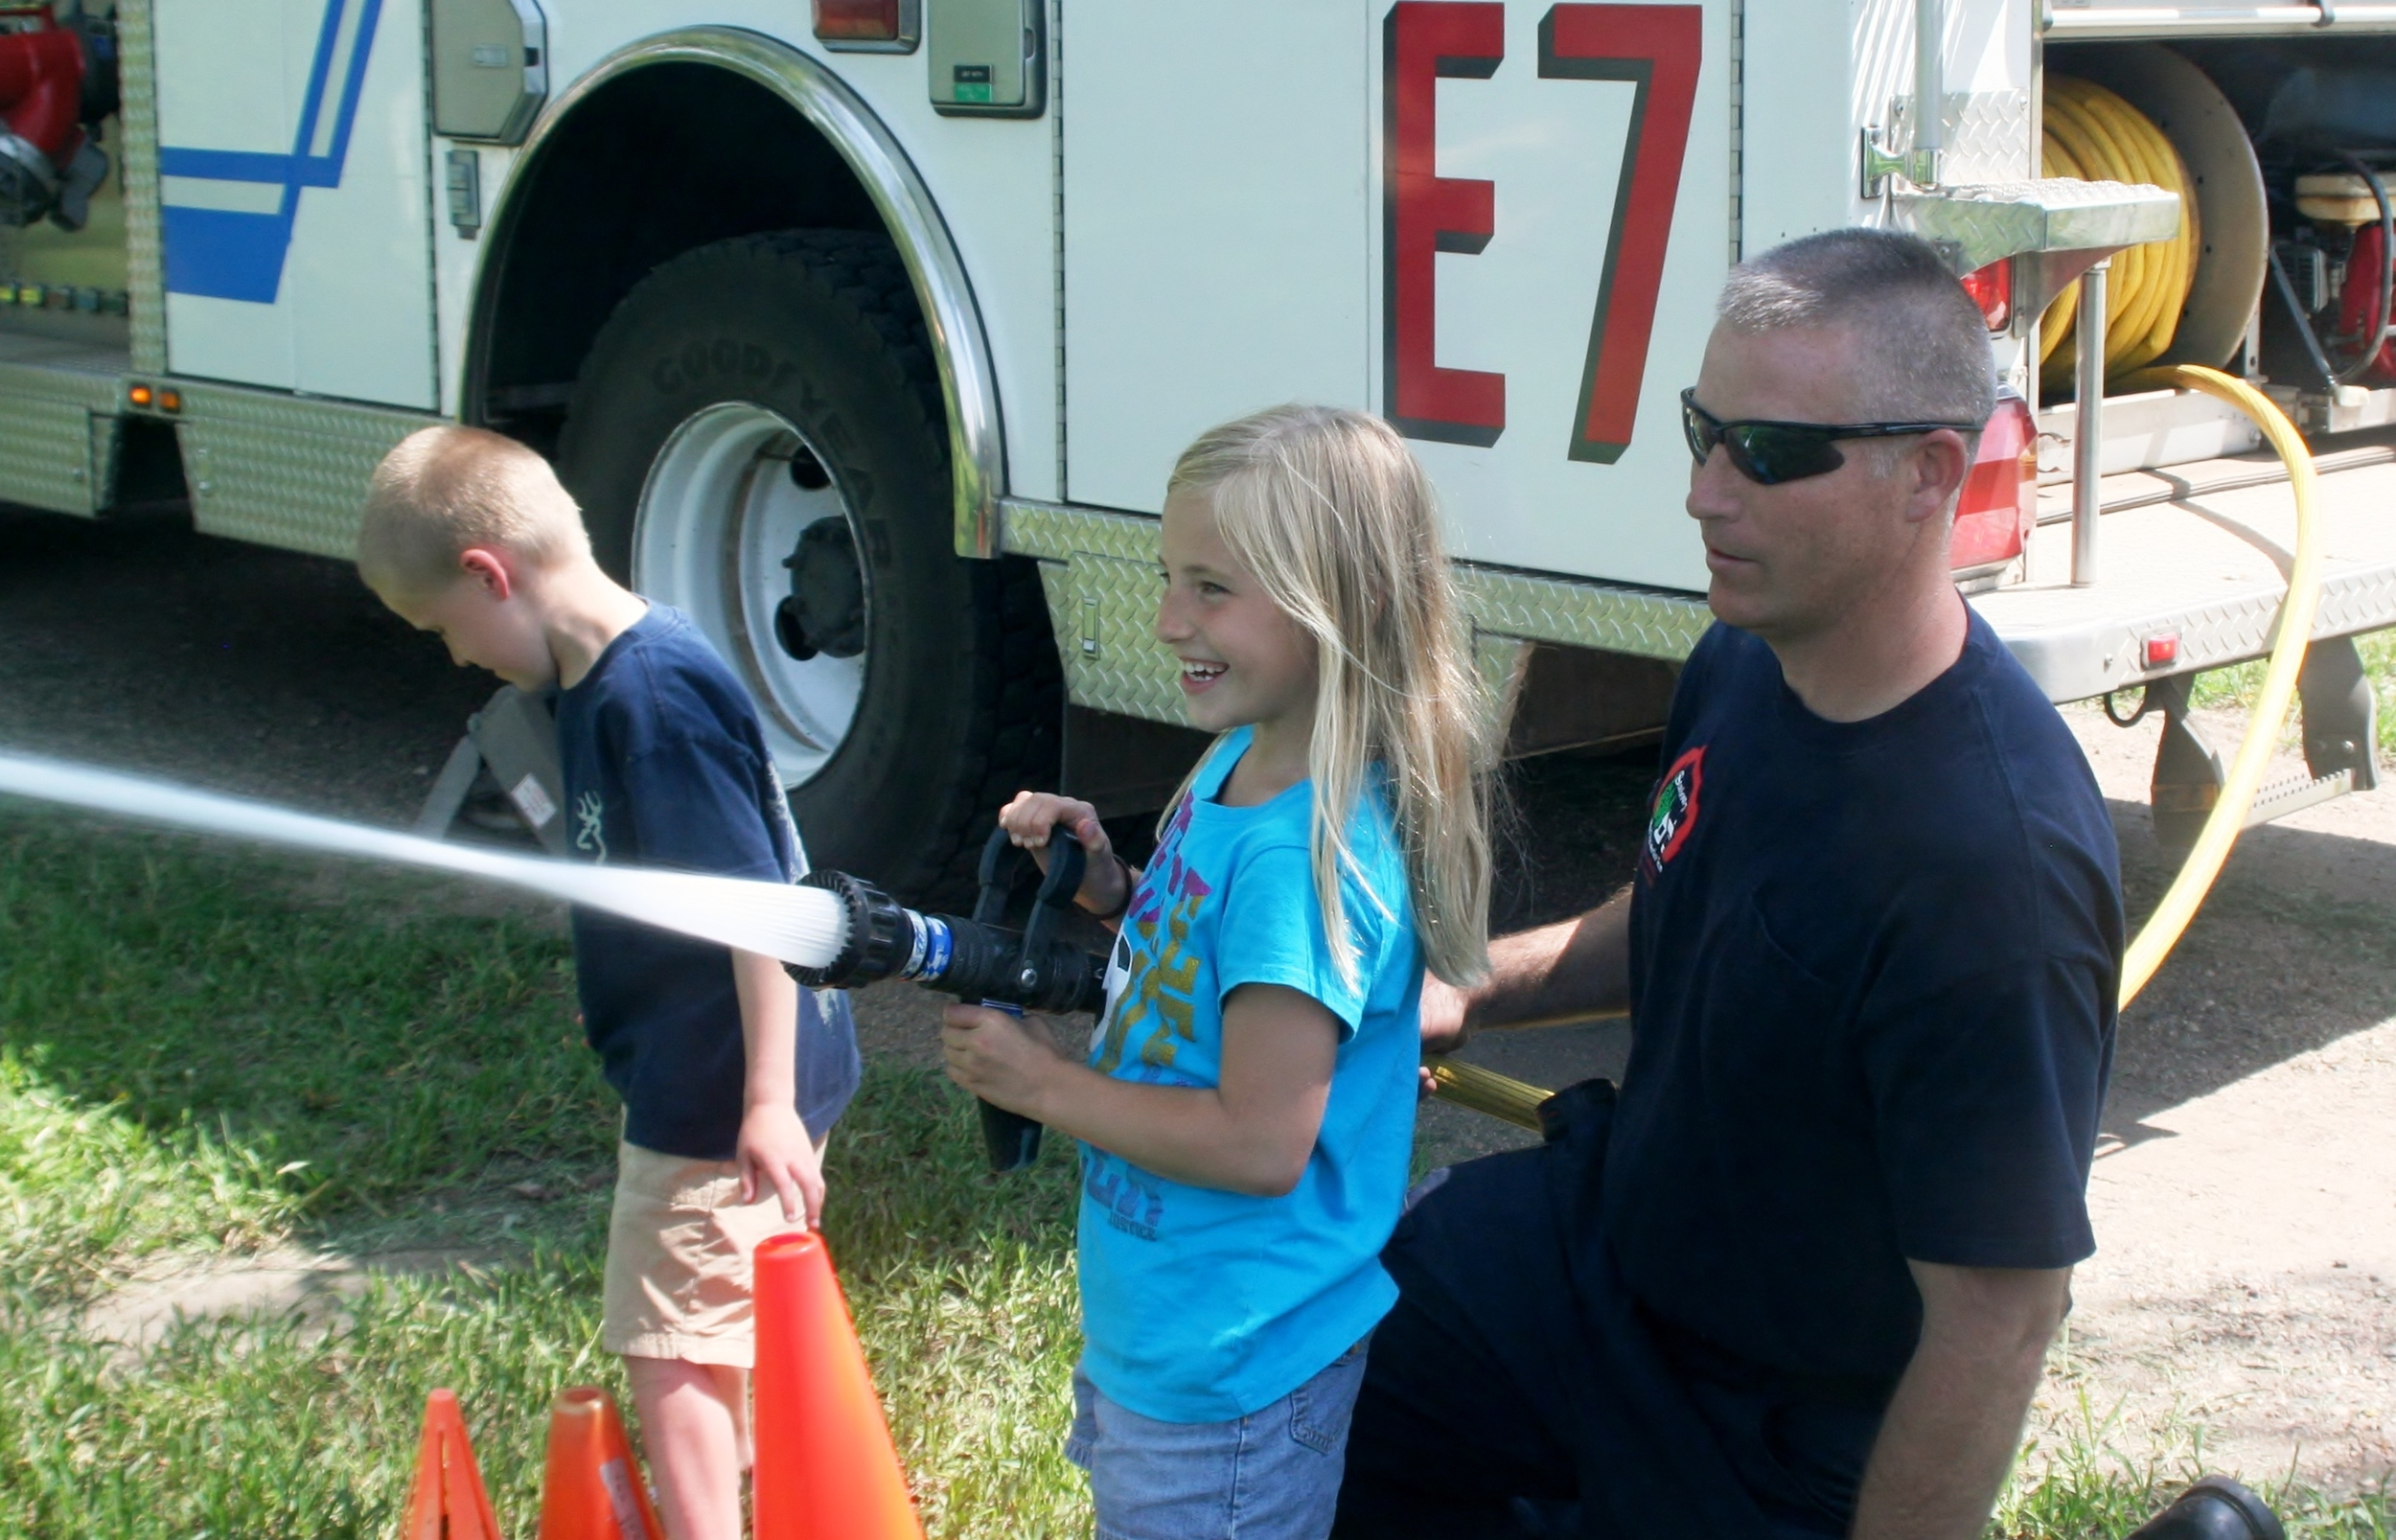 Big Splash Fire hose 2011.jpg